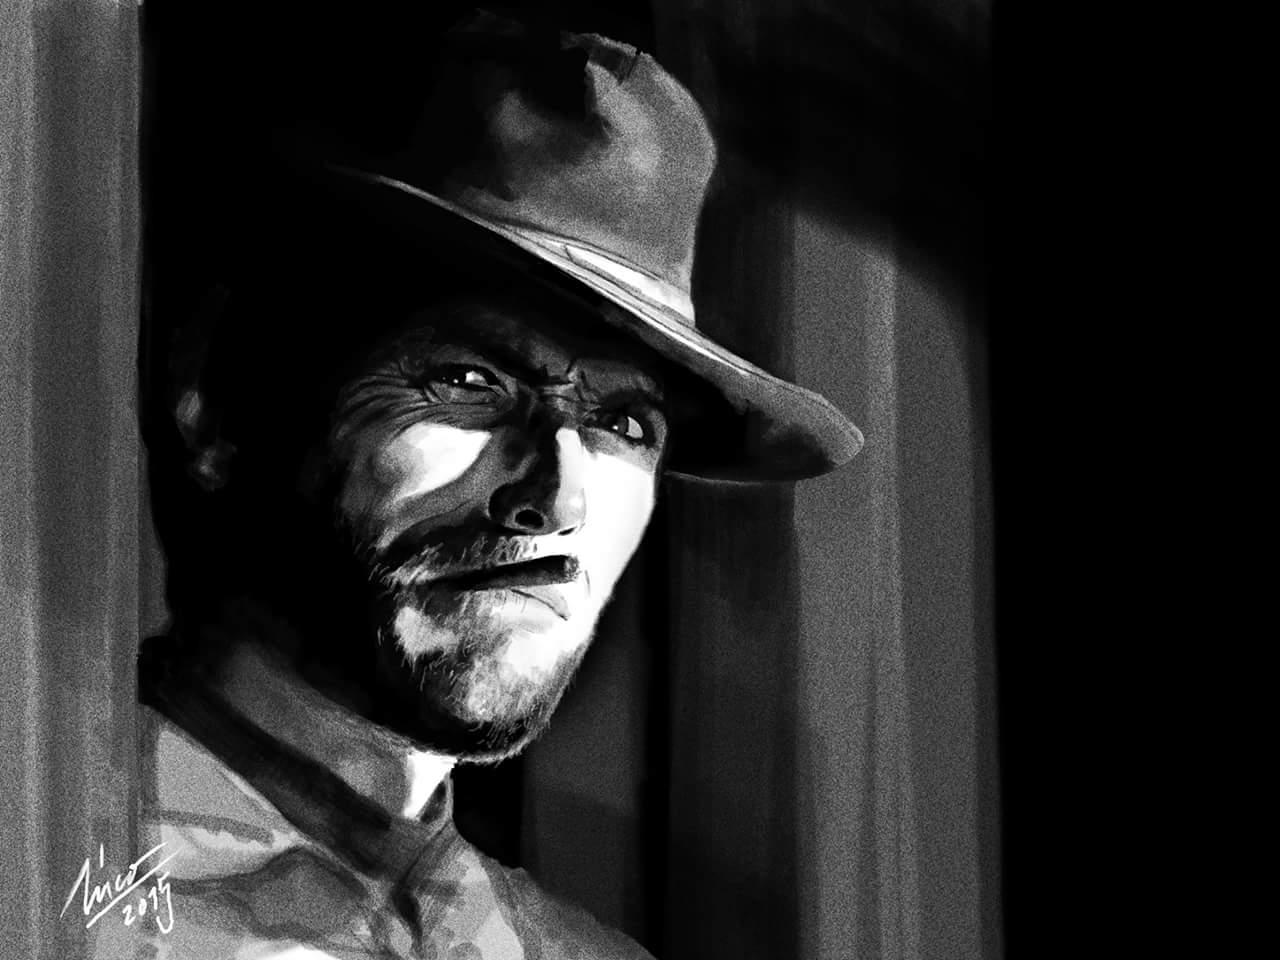 #CreativeJam Clint Eastwood